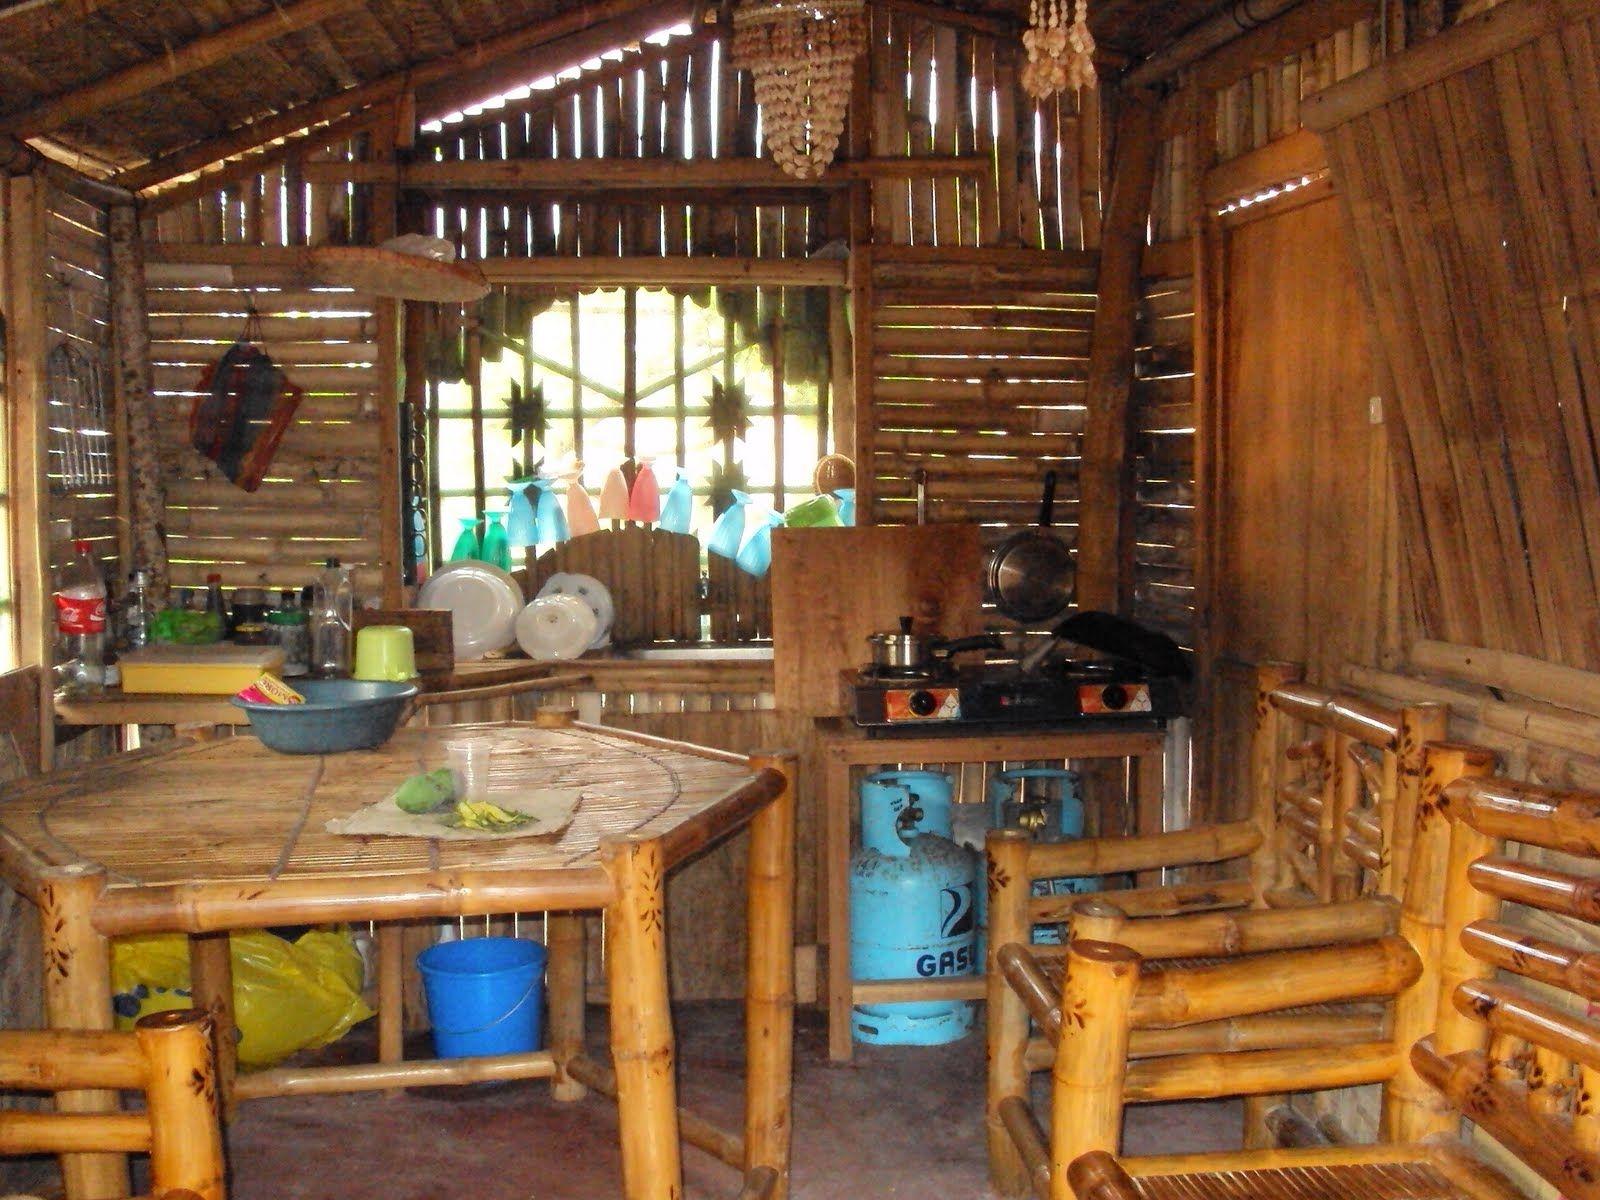 House design kubo - Image Result For Inside Bahay Kubo Design